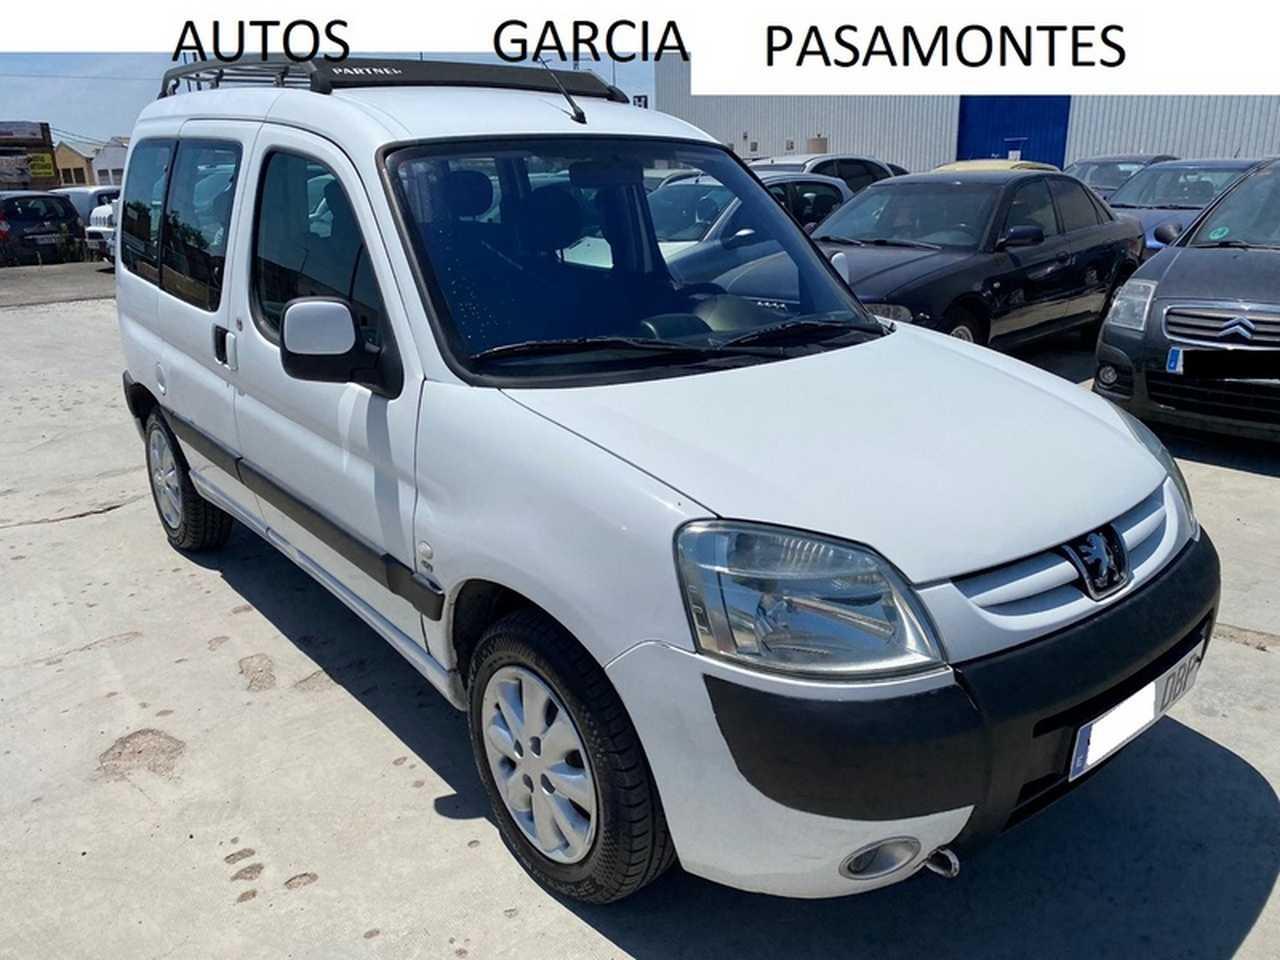 Peugeot Partner 2.0HDI 90 CV ECONOMICA  Y MUY CUIDADA  - Foto 1